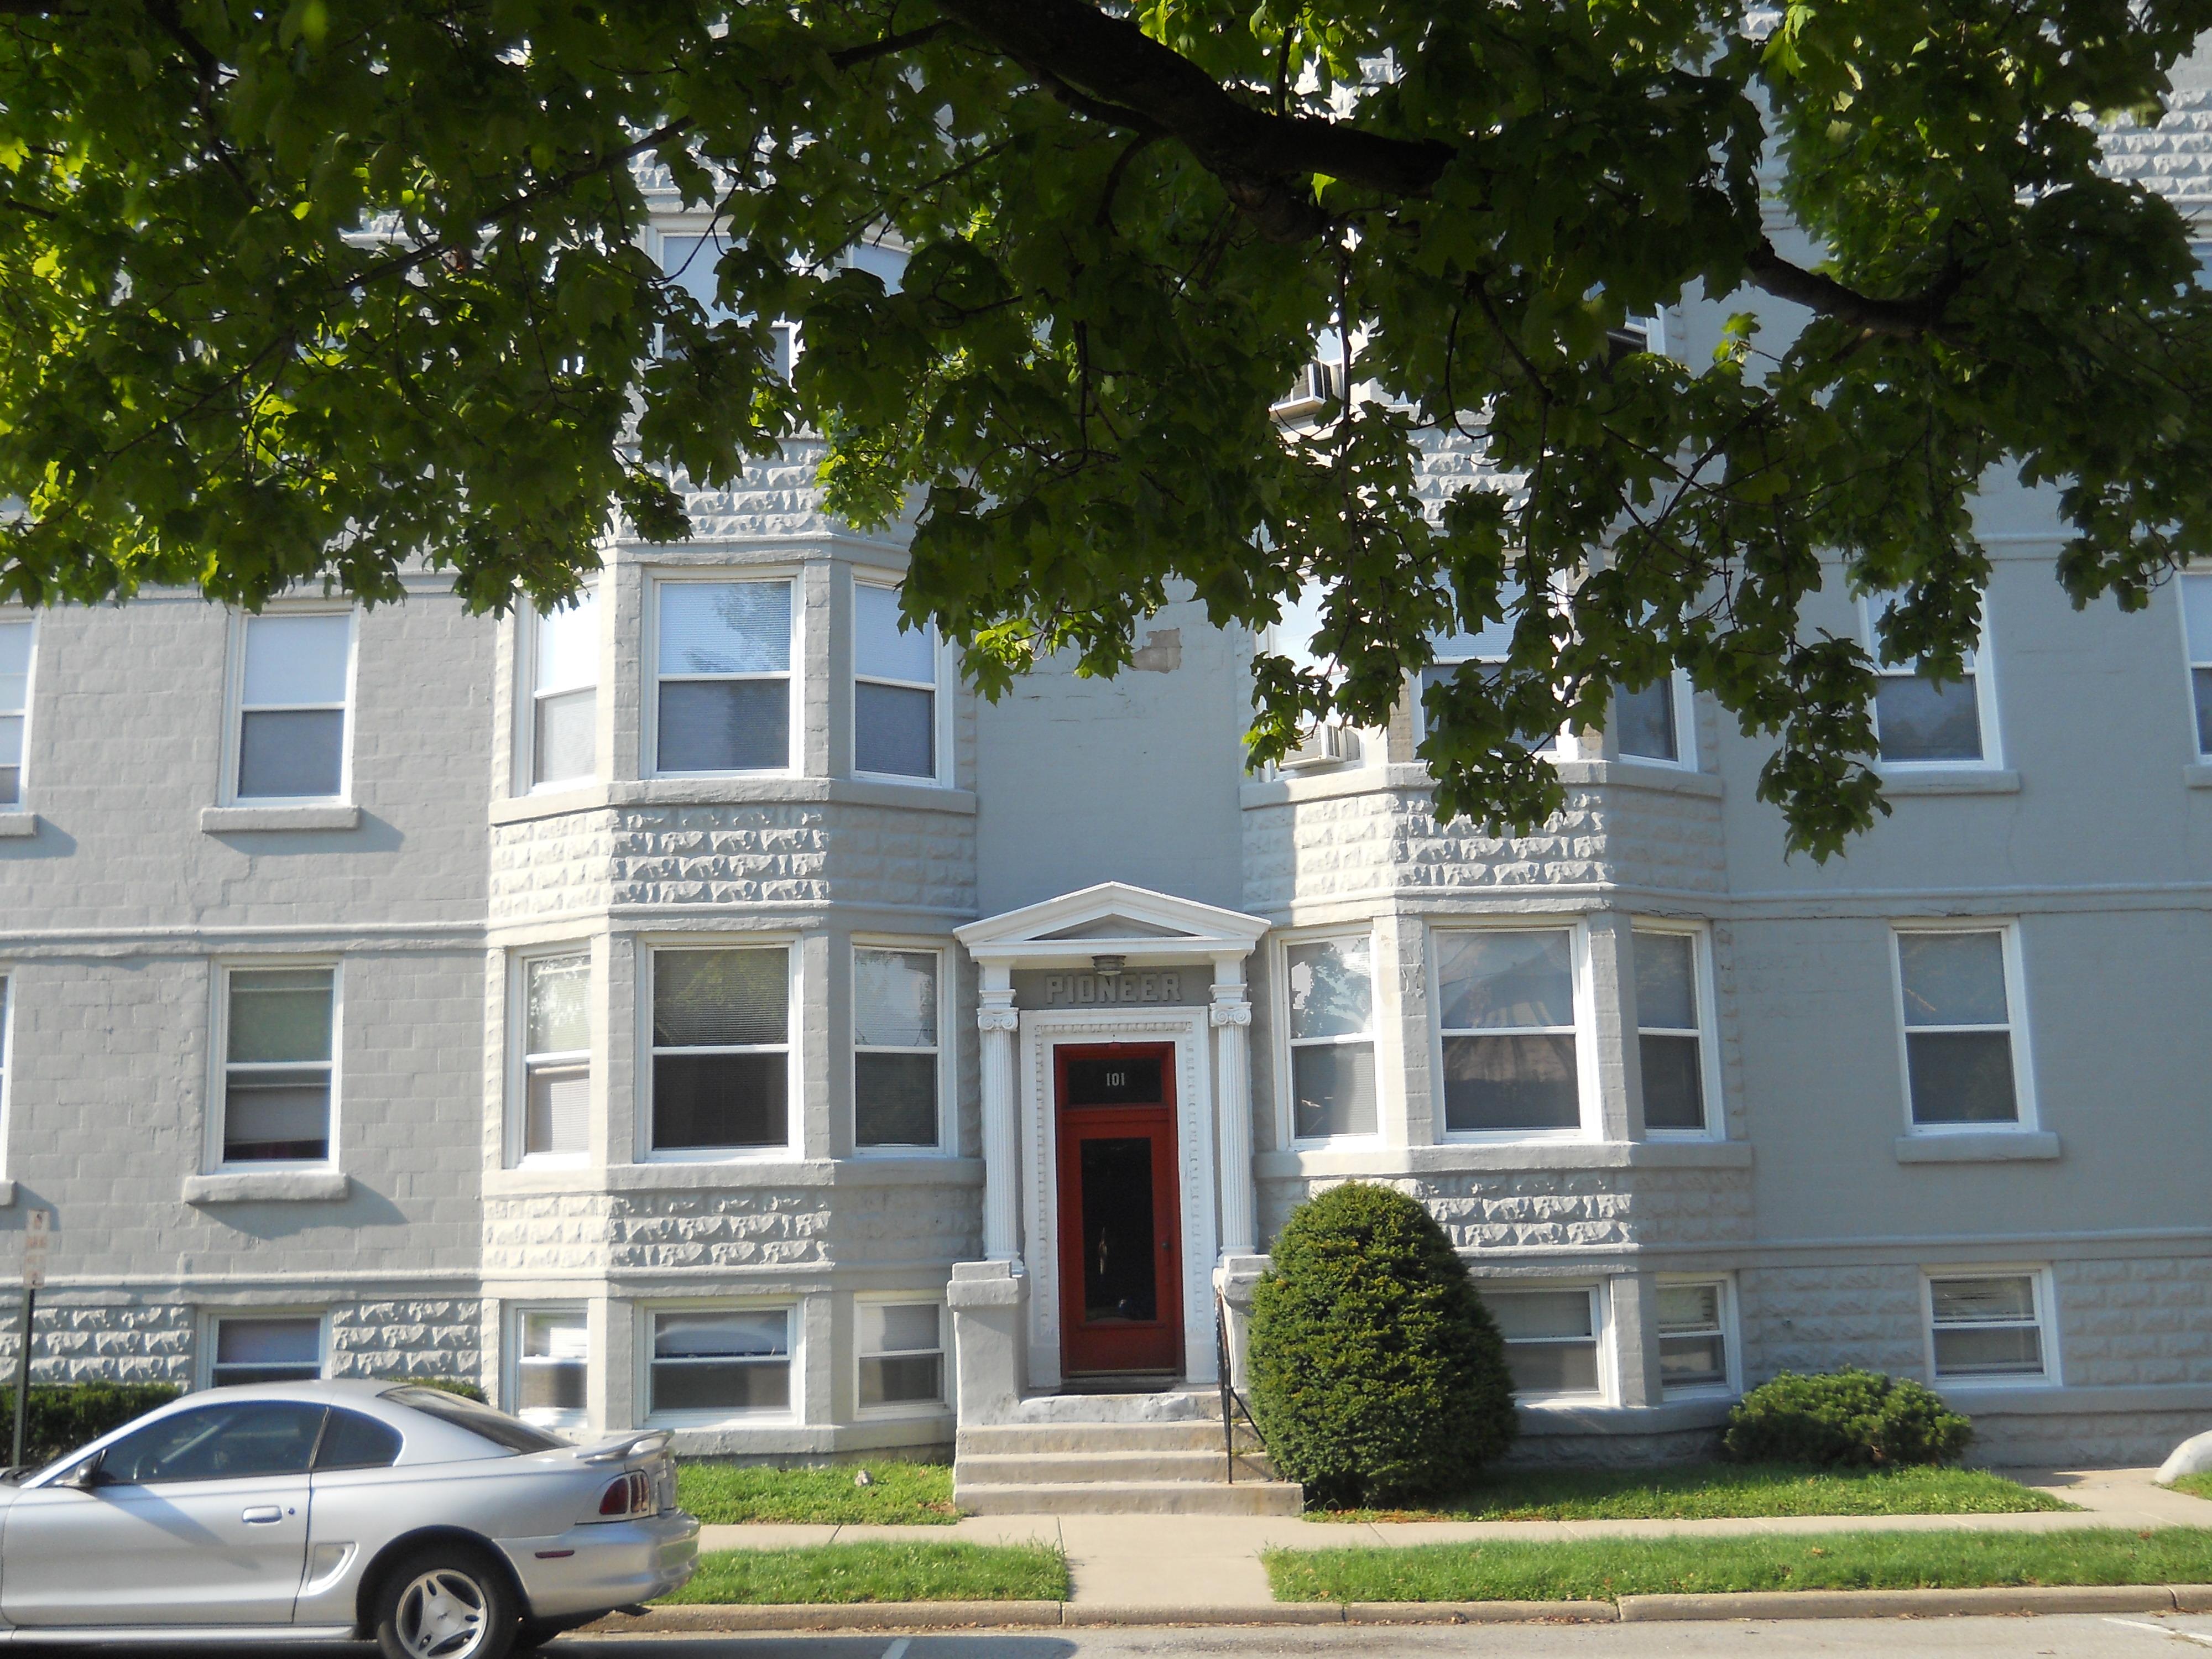 apartments $ 750 $ 795 month 900 sq ft three bedroom apartments $ 950